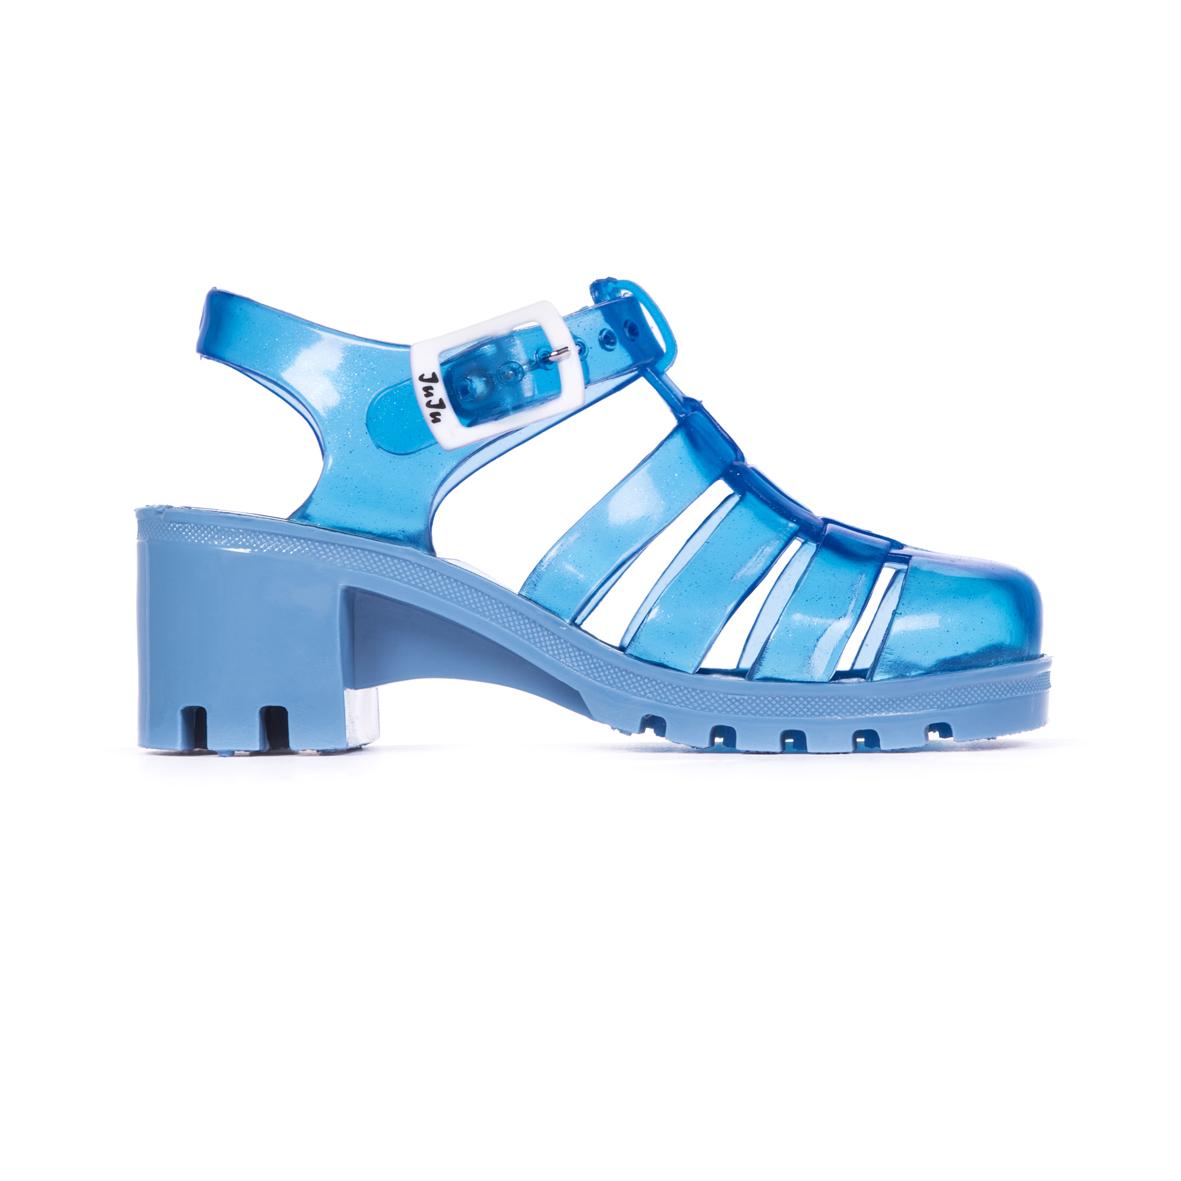 BABE JNR DENIM BLUE SPARKLES.DENIM BLUE LR #1.jpg